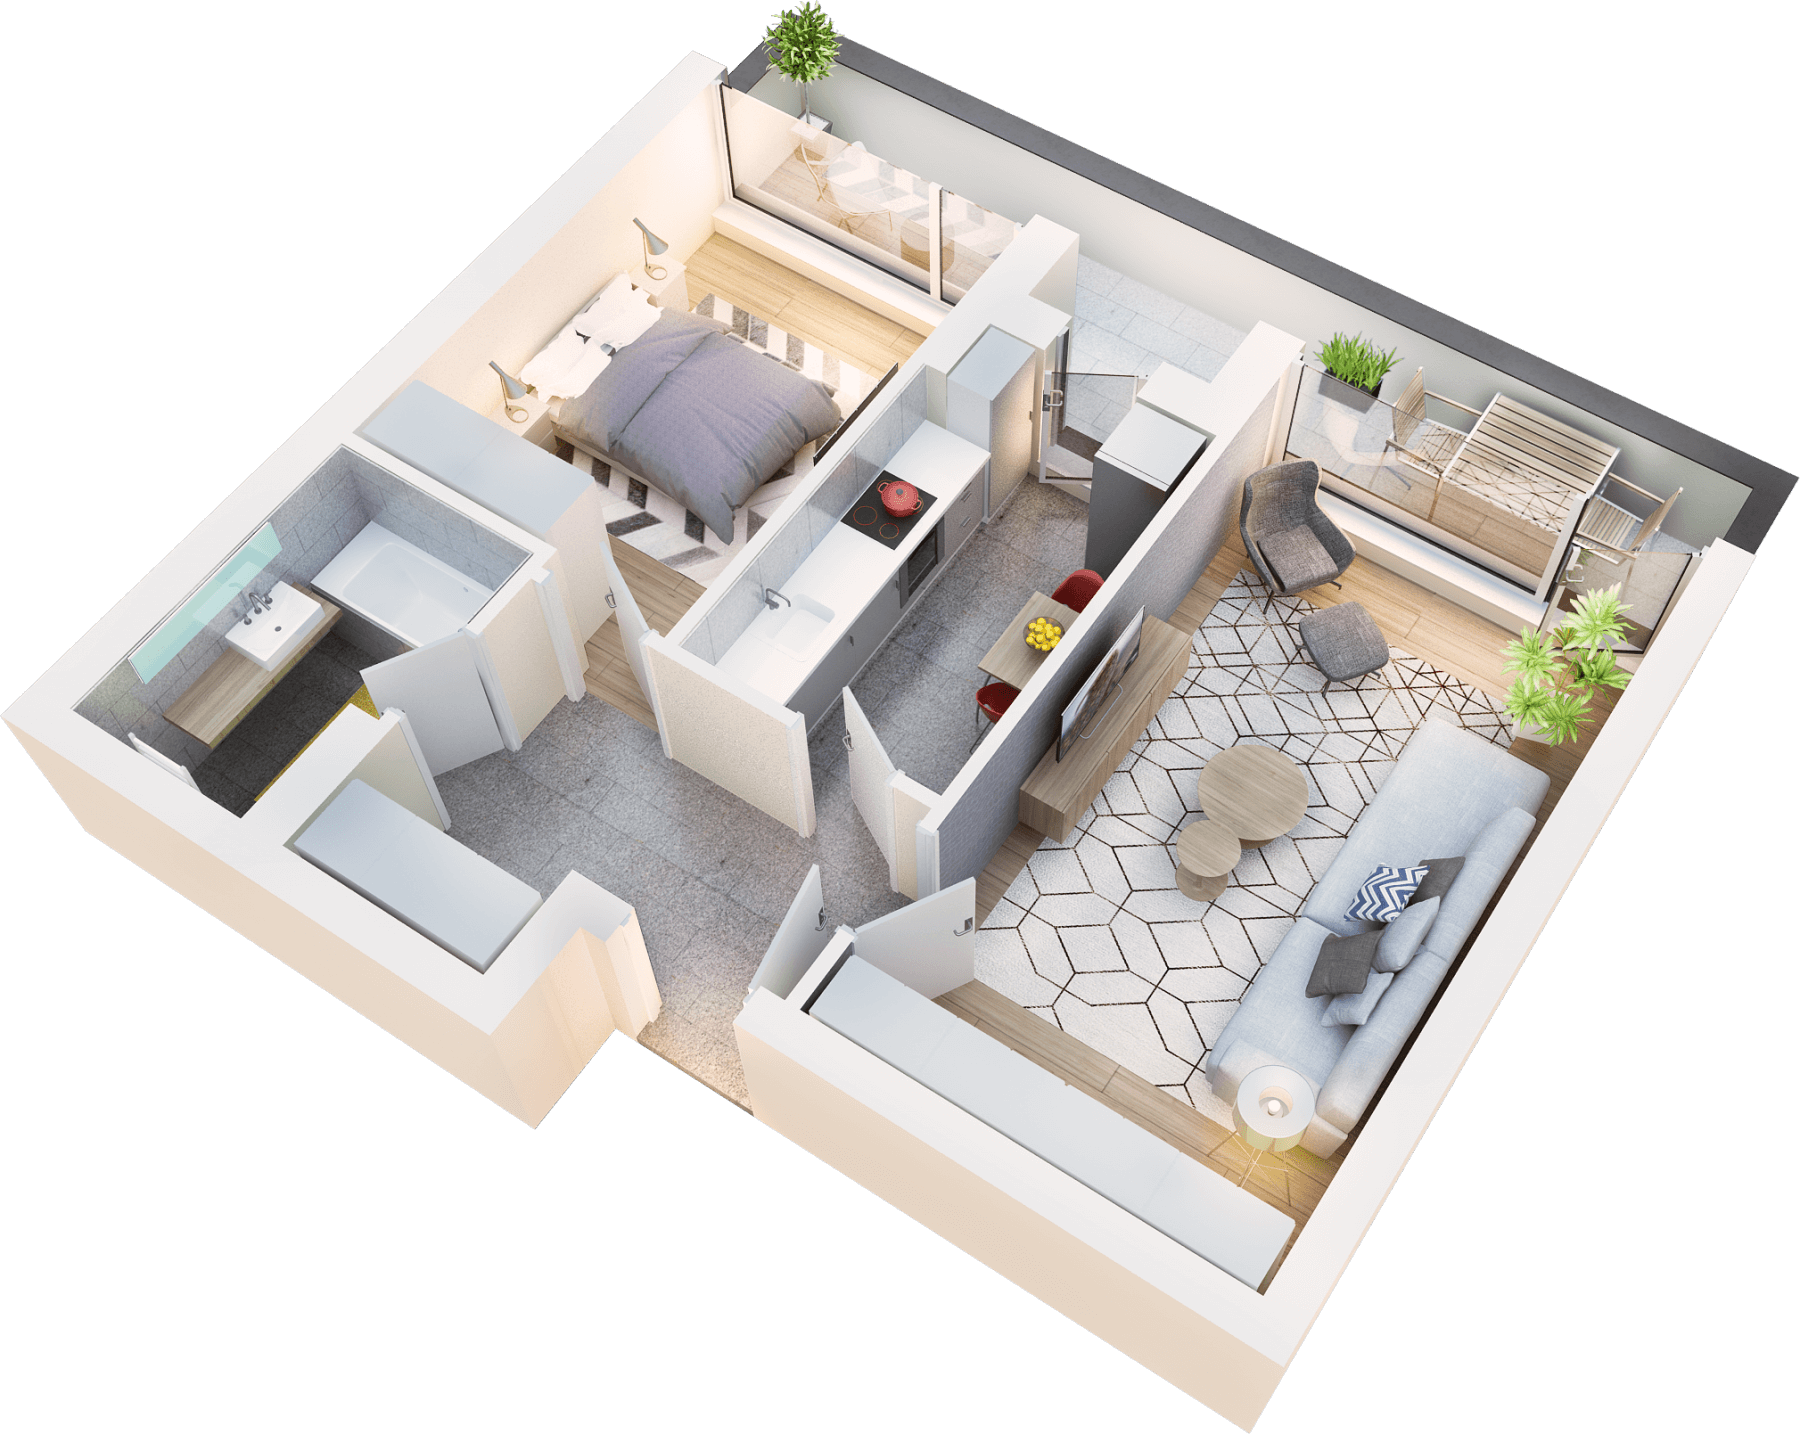 Apartament 2 camere tip 2C.3 balcon | etaj 4 | Cladire 1A | Faza 1